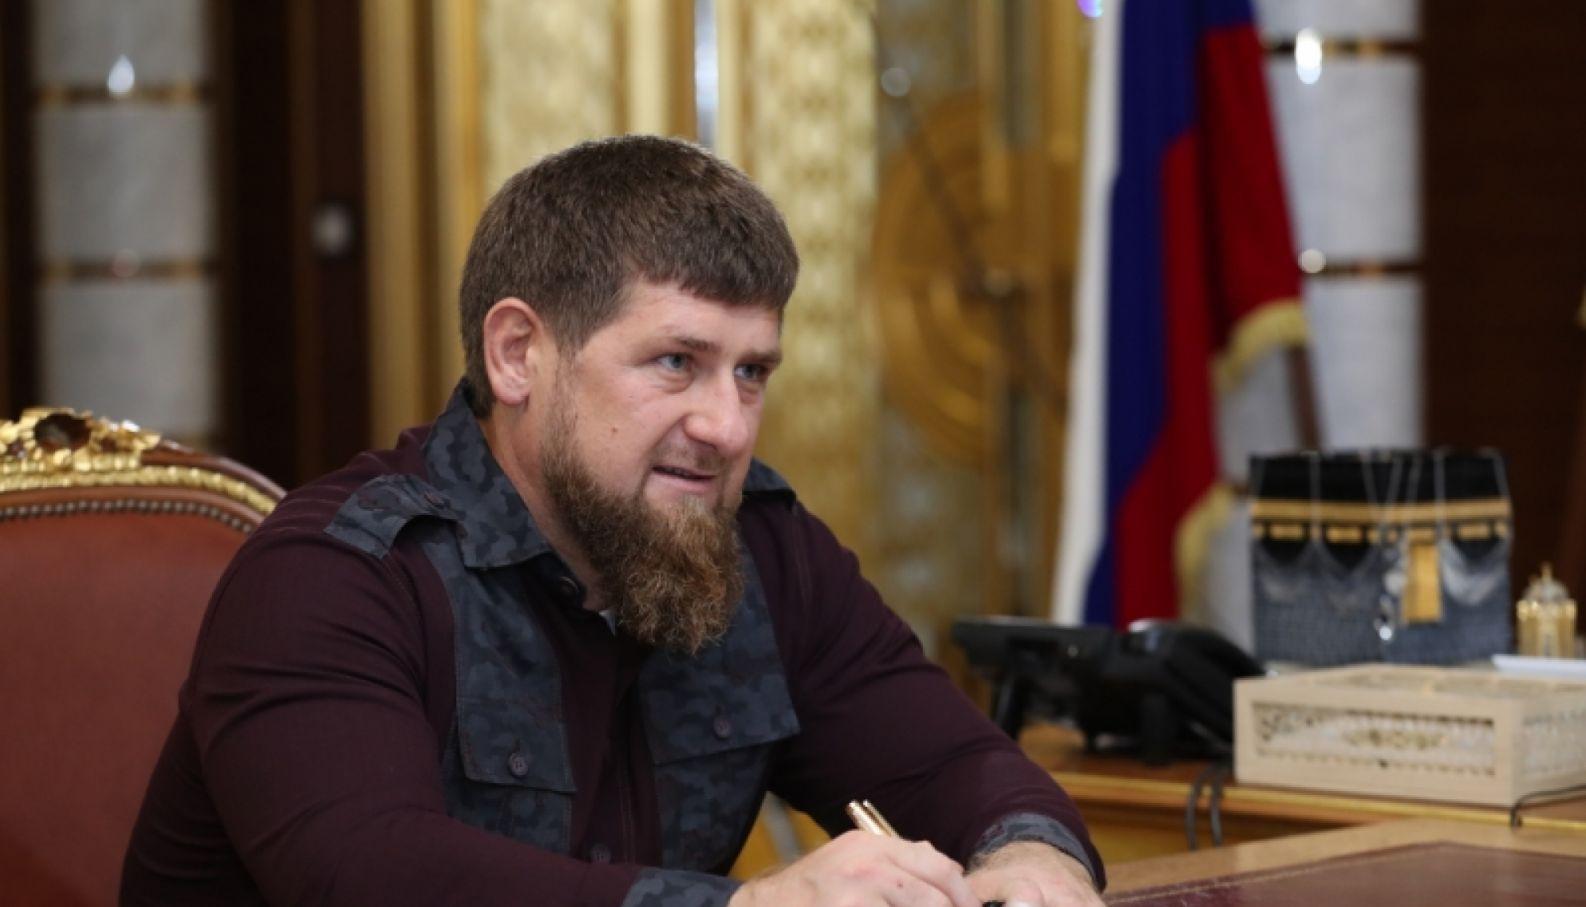 Рамзан Кадыров, ctnews.ru